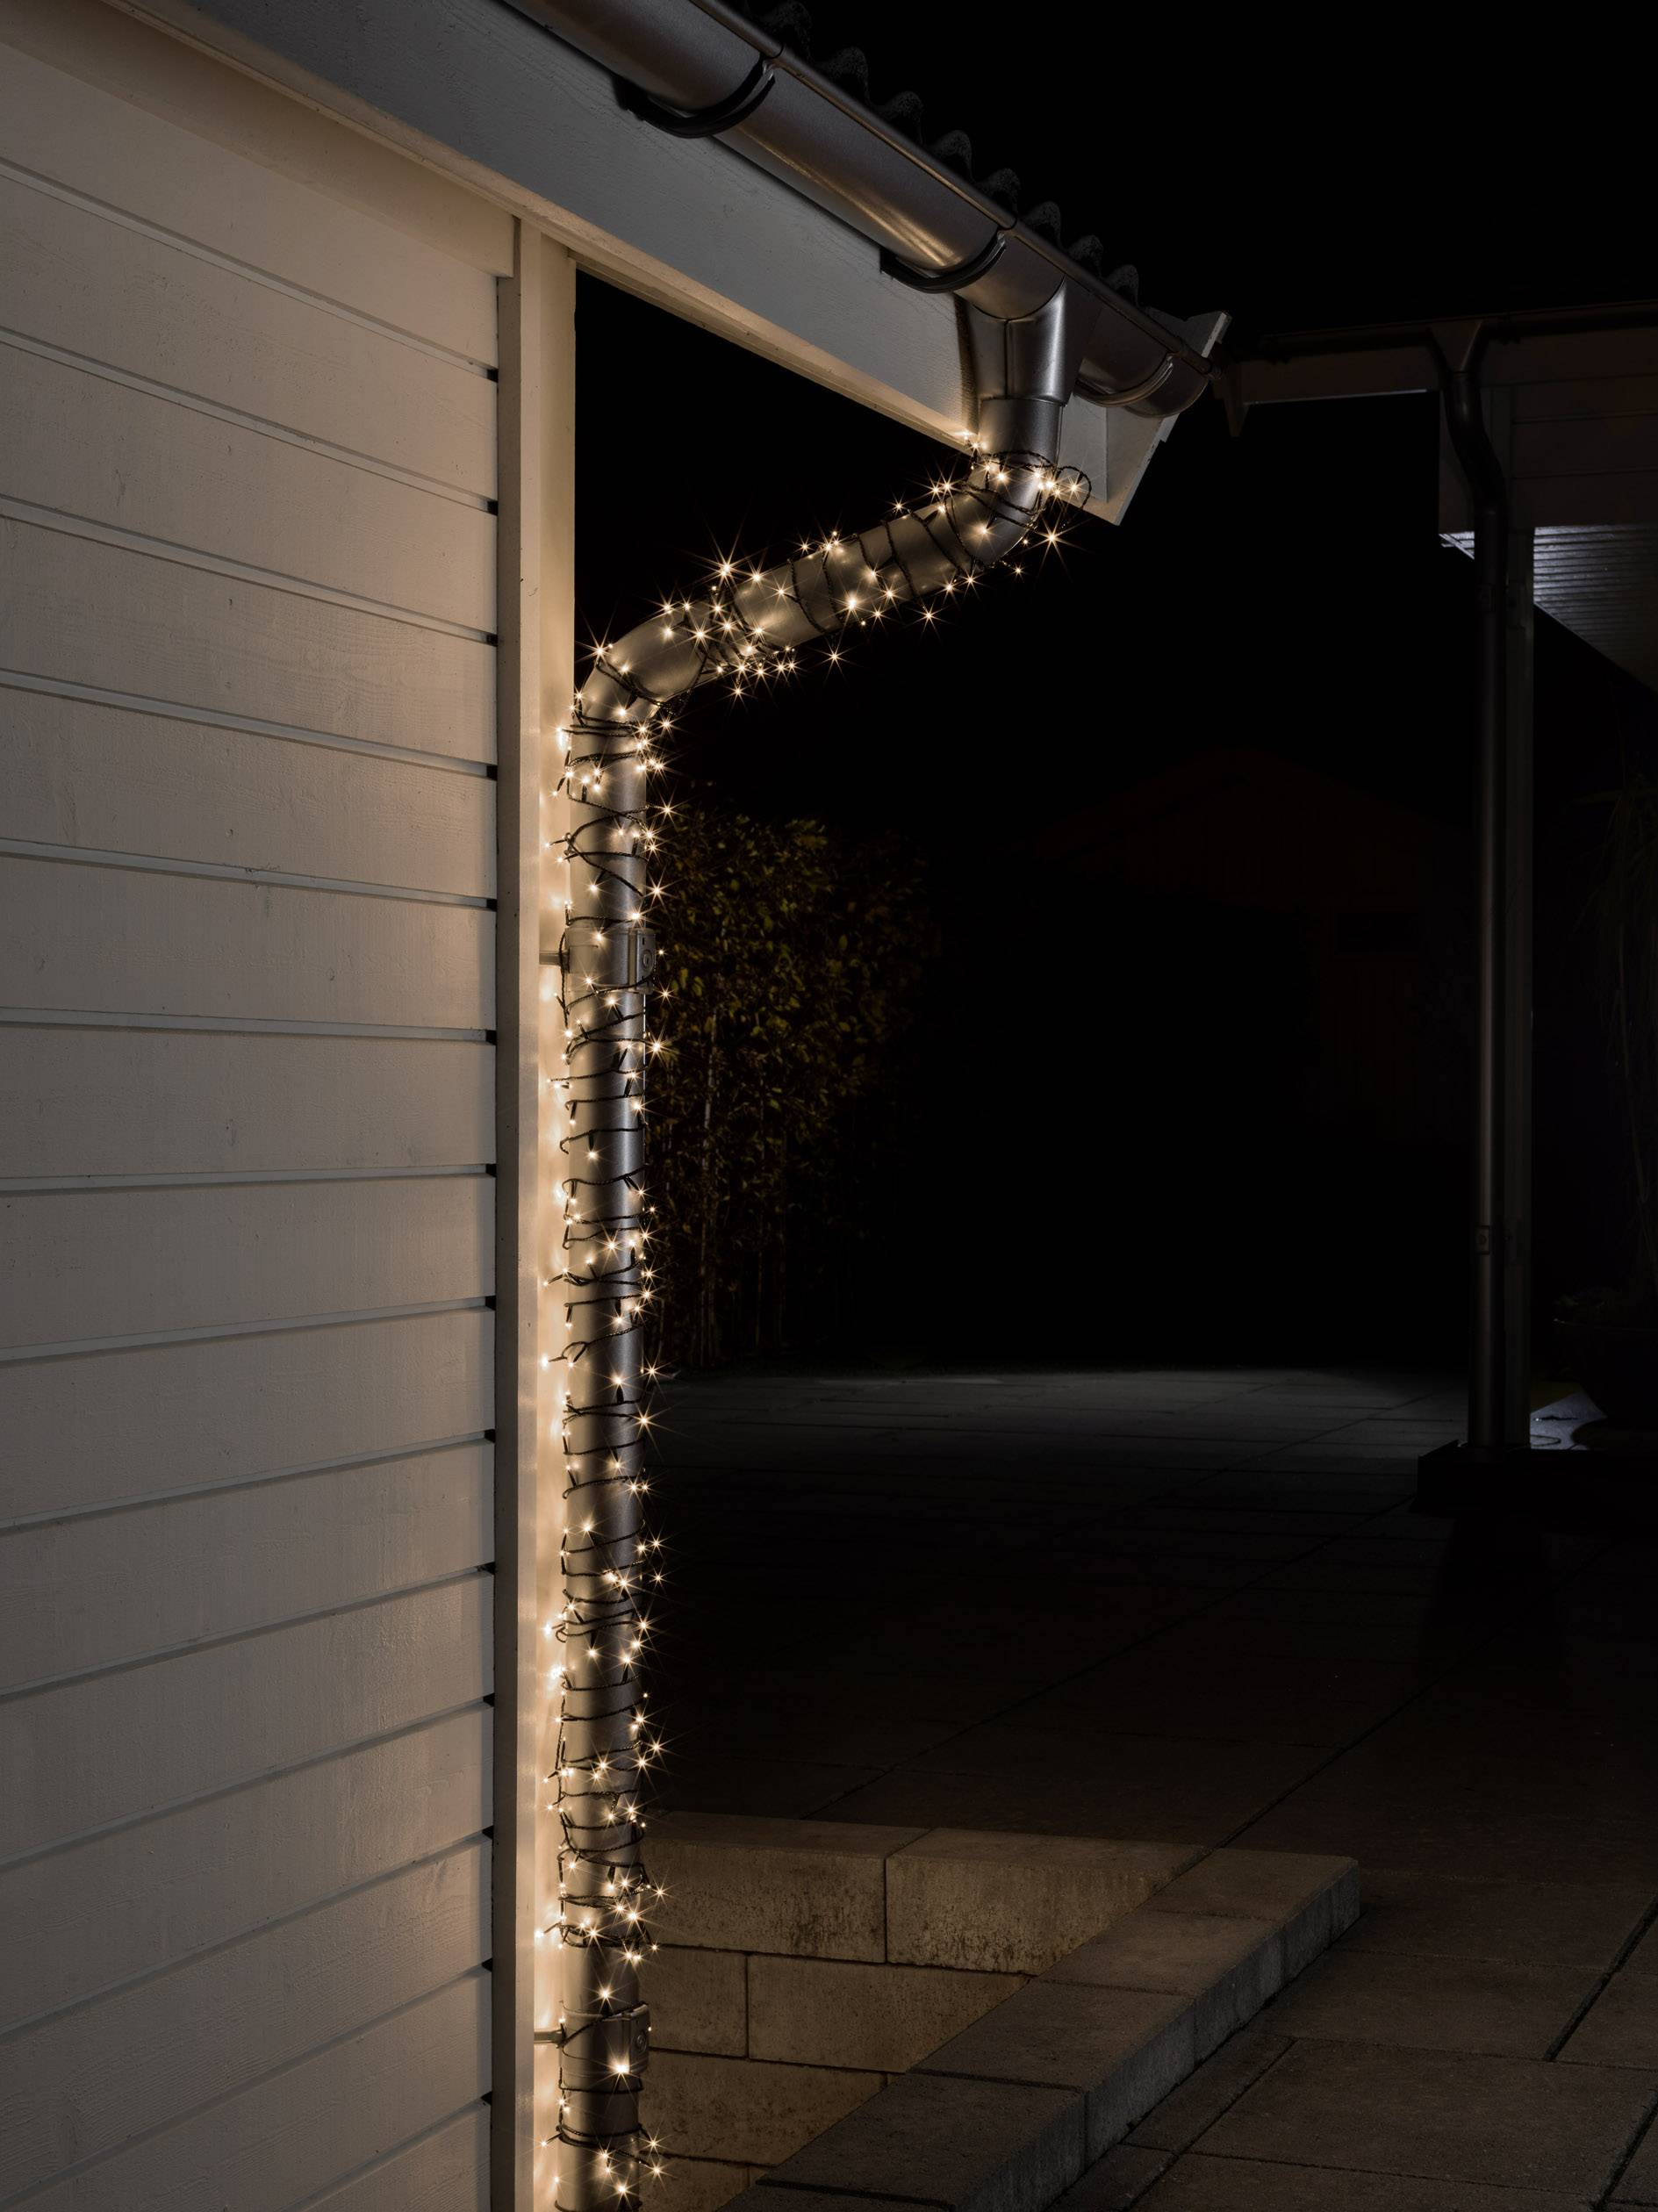 20 m Warm-Wei/ß Basetech LED BR-LEDR20mww Lichtschlauch EEK A++ - E LED